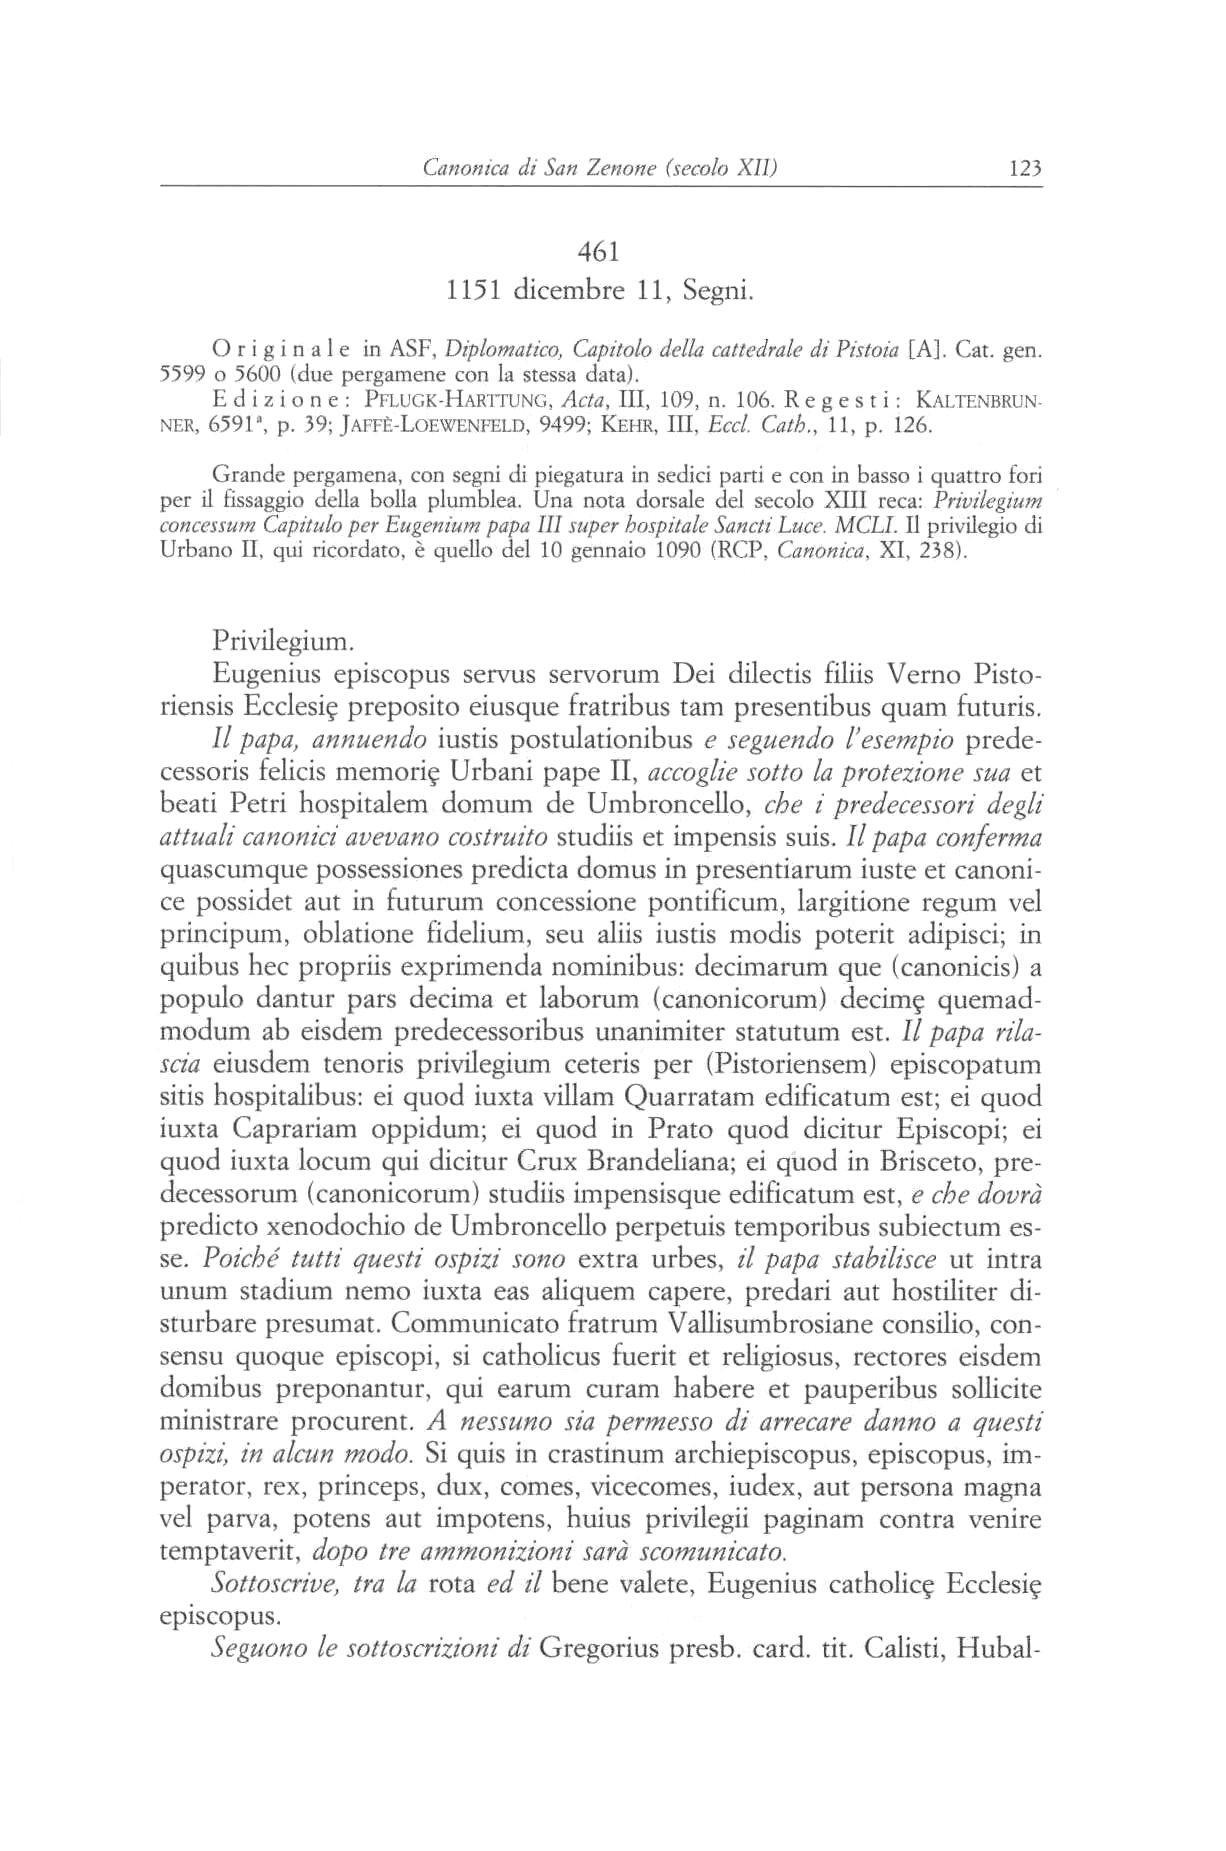 Canonica S. Zenone XII 0123.jpg